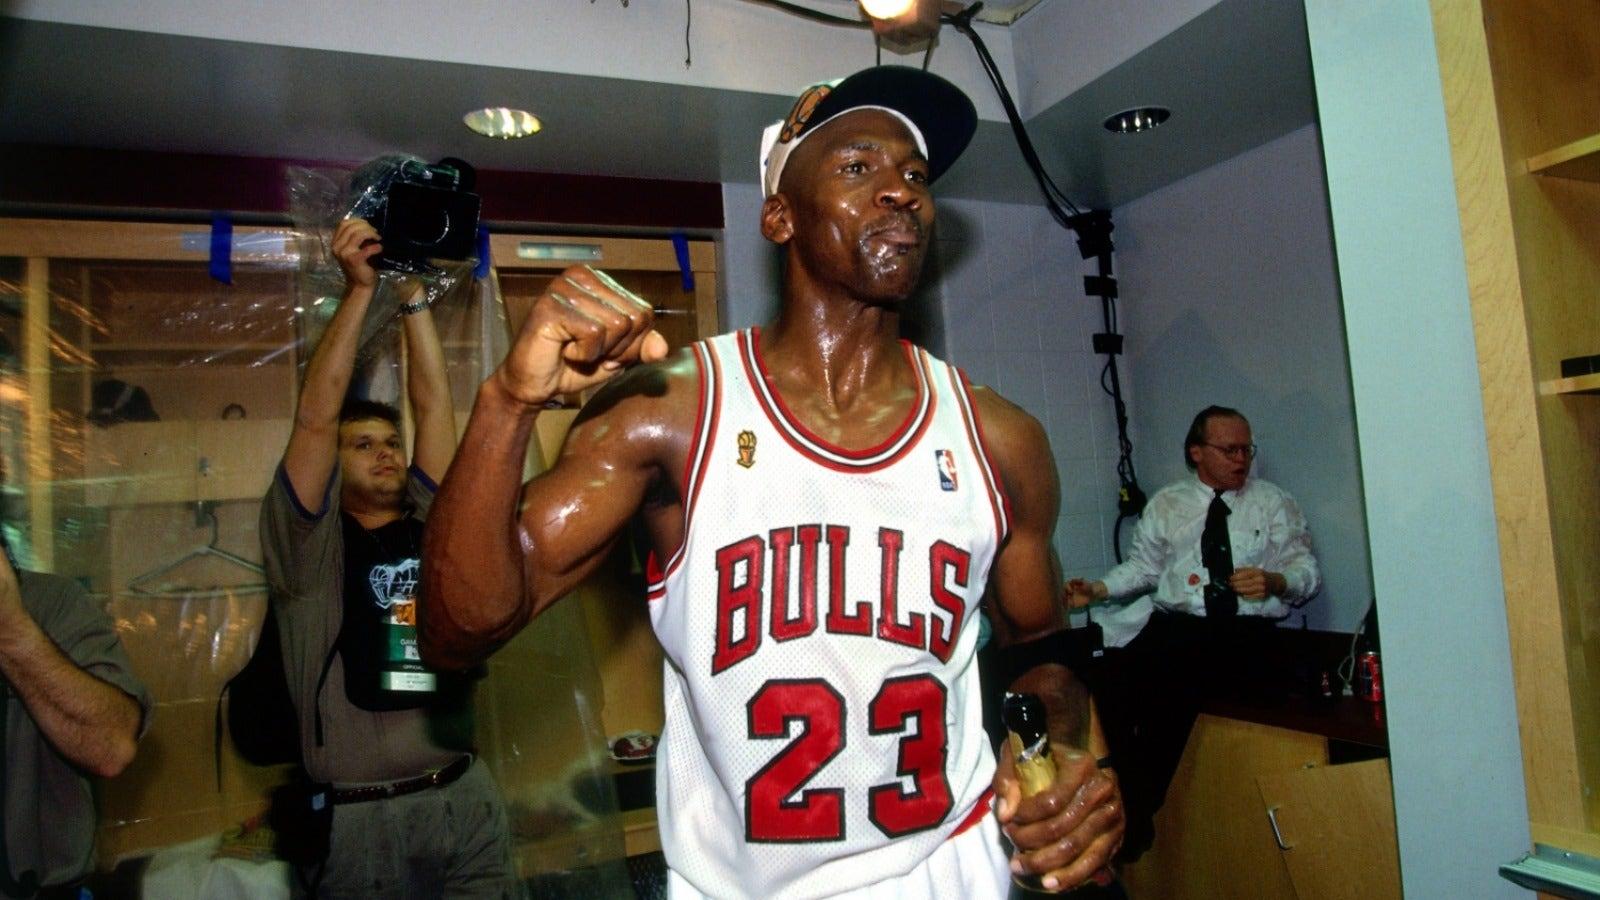 Undisputed': Would the 2017 Warriors beat Michael Jordan's